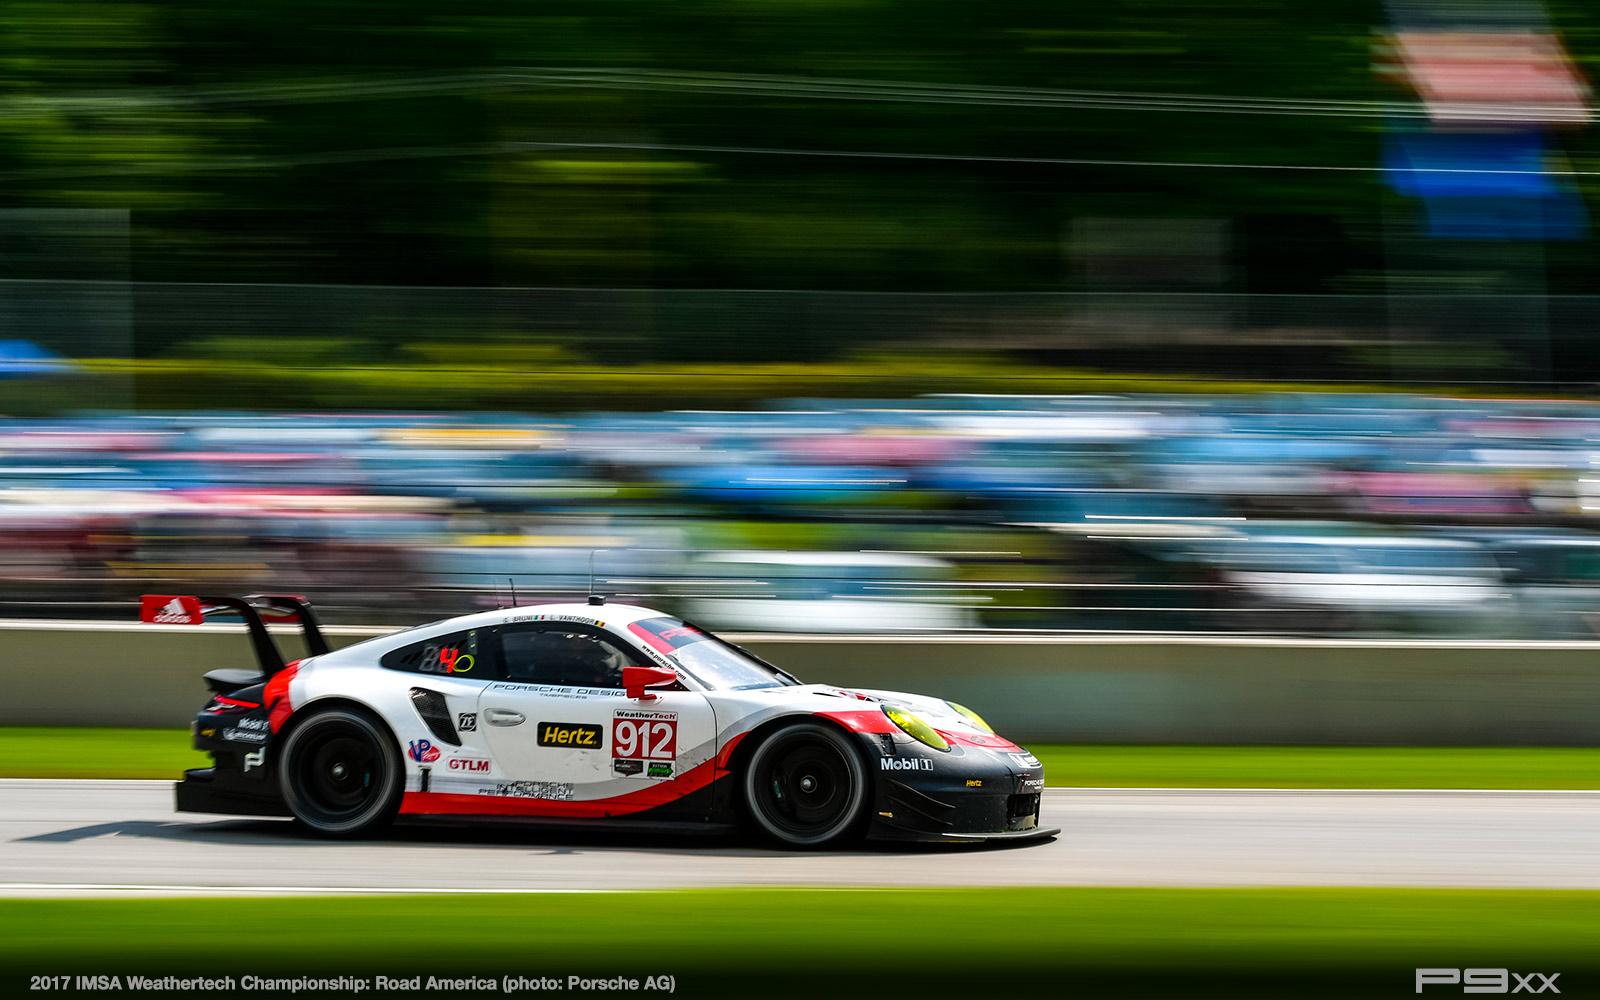 2017-IMSA-Weathertech-Road-America-Porsche-354